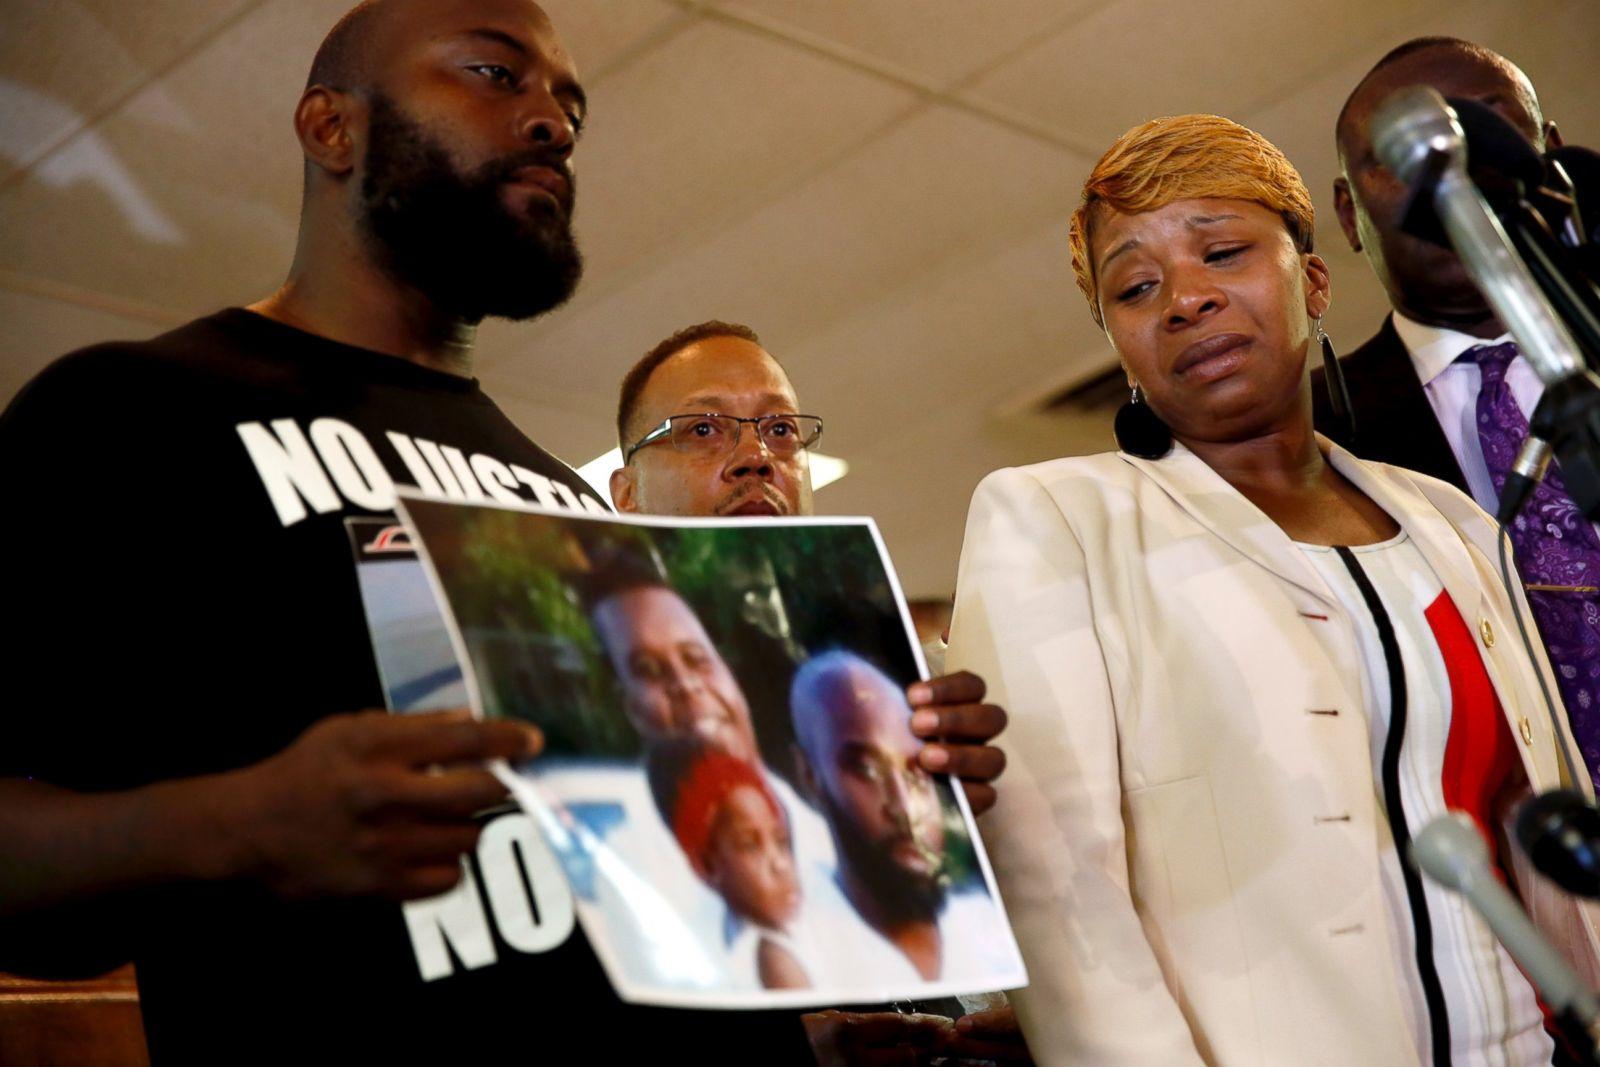 How Ferguson Reacted When Michael Brown Was Shot Photos - ABC News